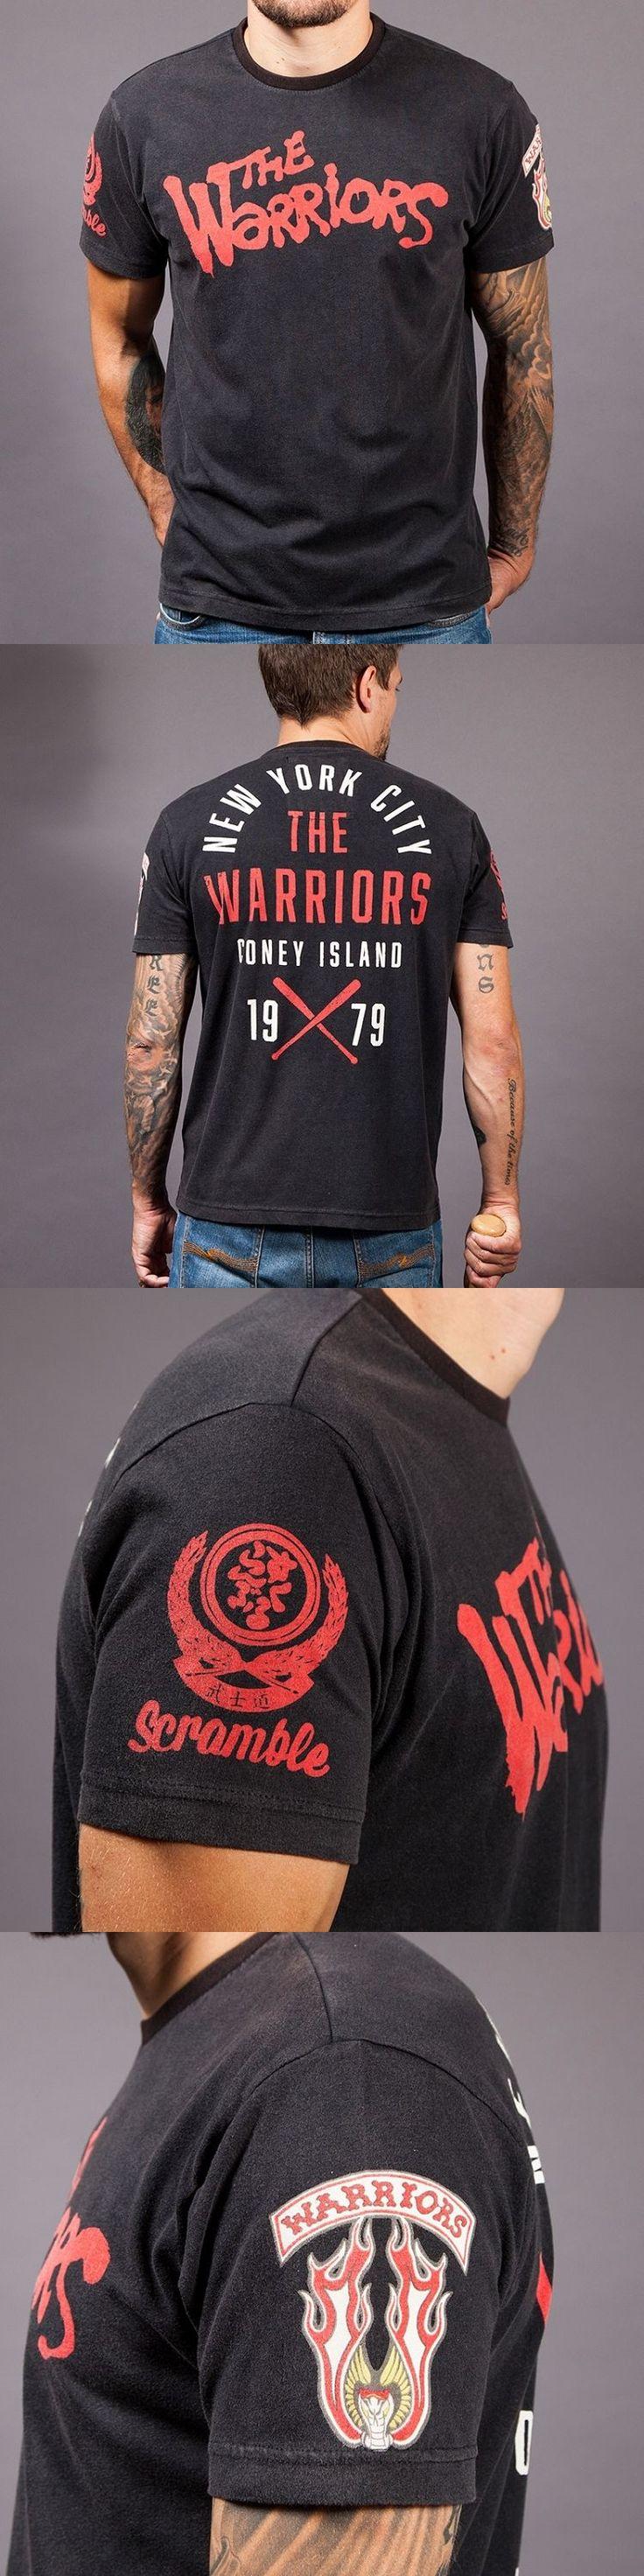 Shirts 73983: Scramble The Warriors Official T-Shirt Jiu Jitsu Bjj No Gi Grappling -> BUY IT NOW ONLY: $48.92 on eBay!